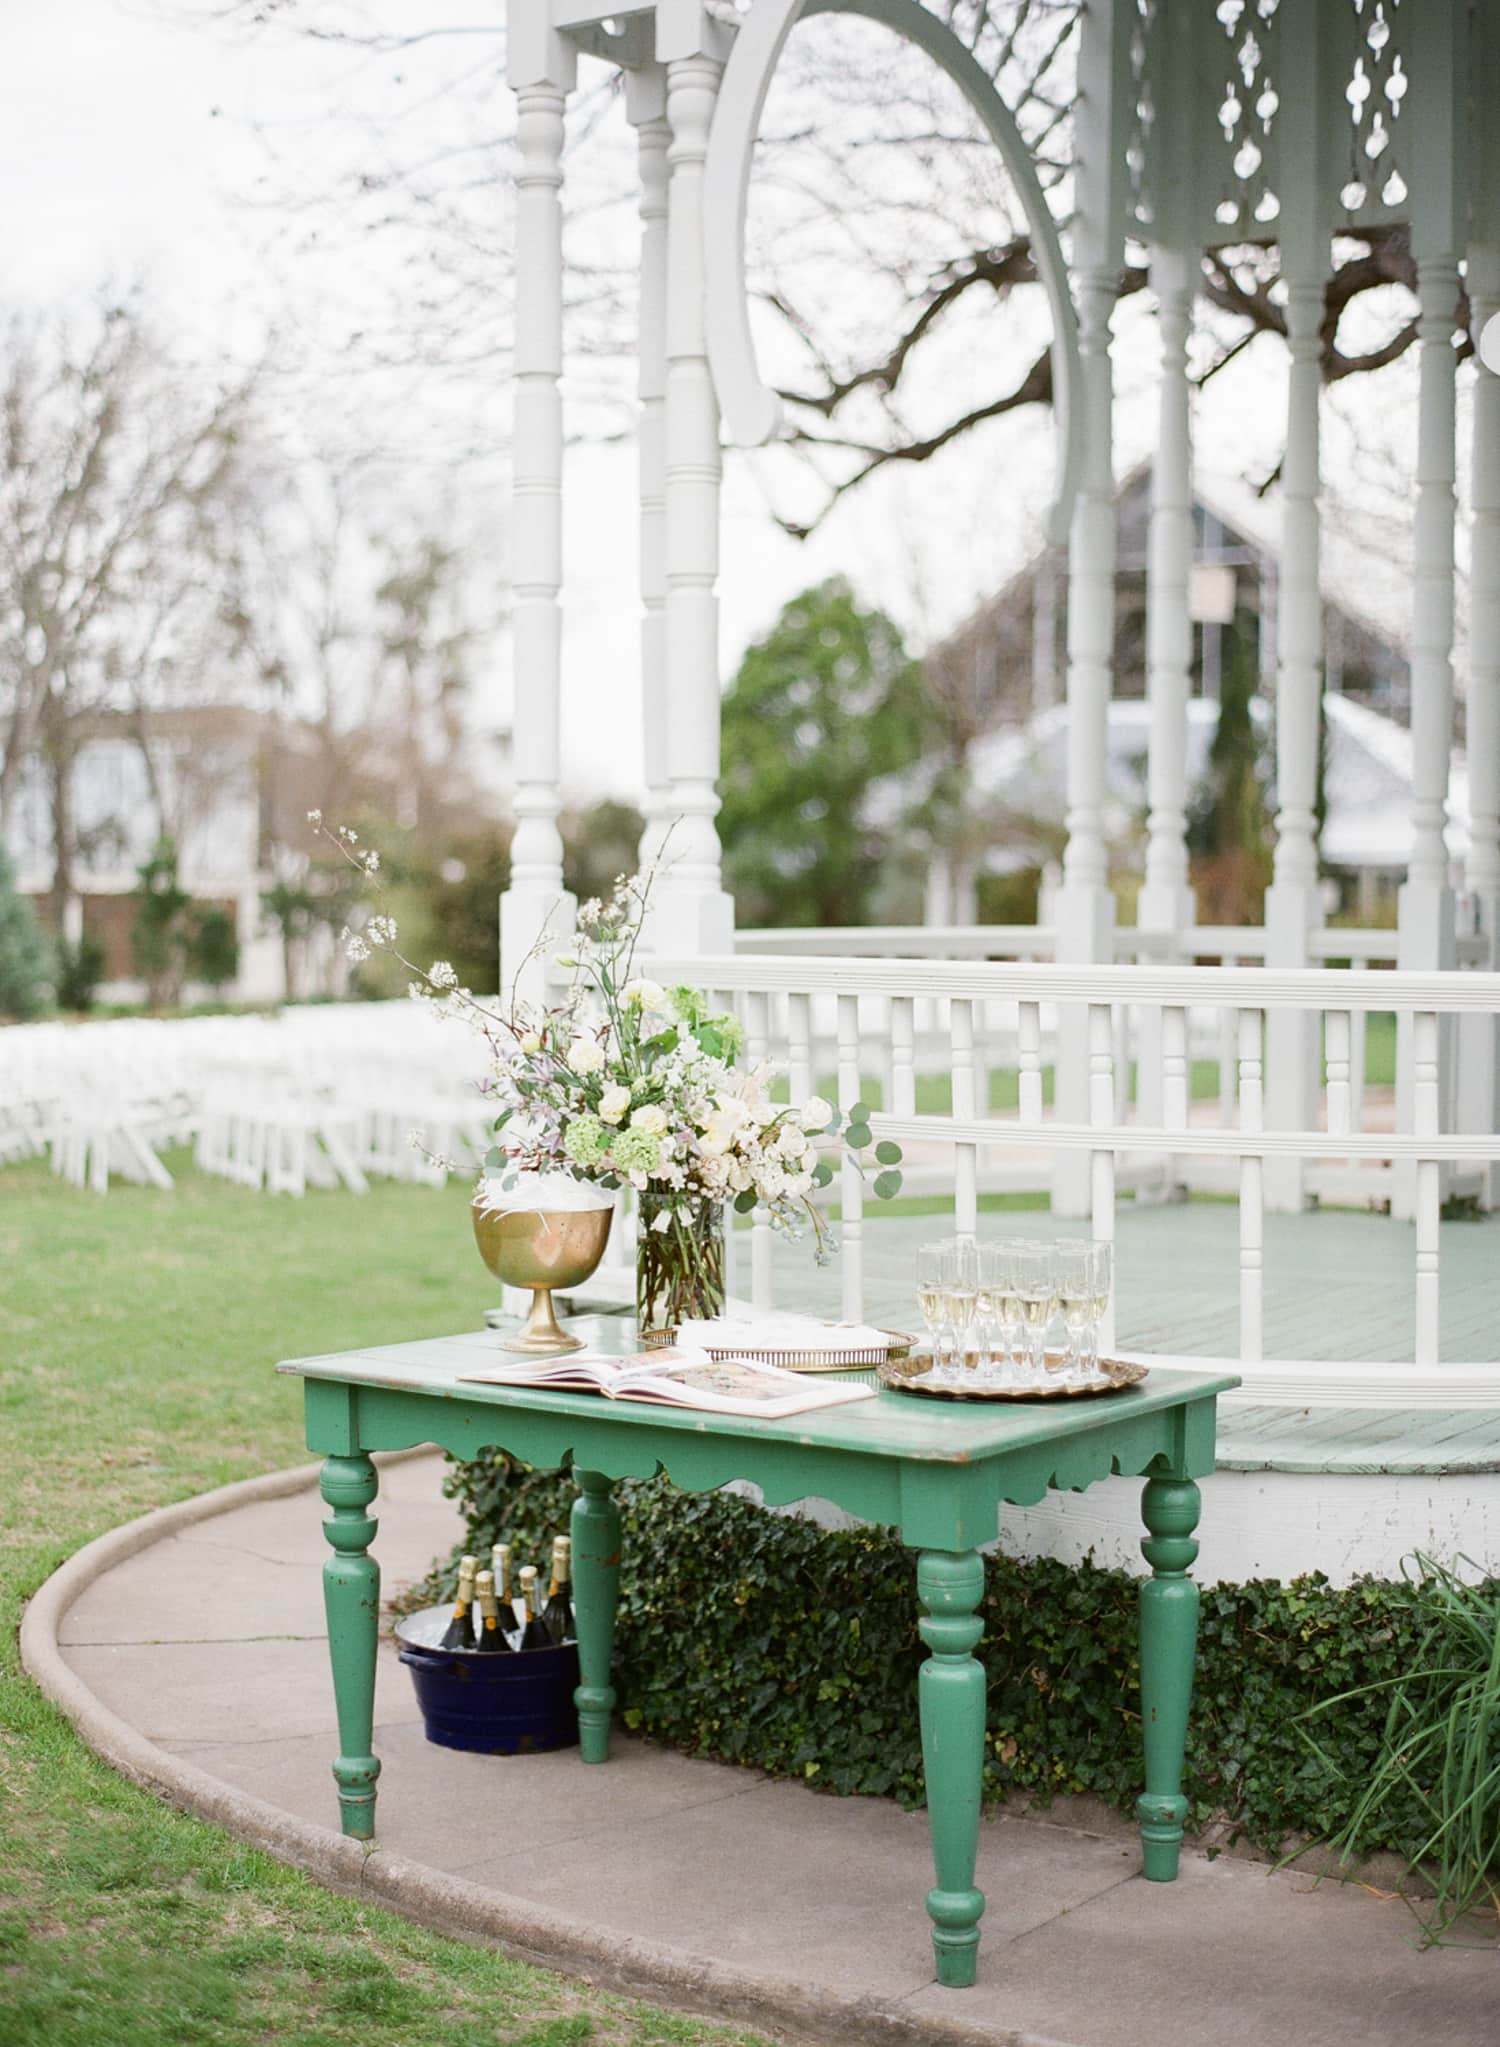 barr-mansion-wedding-7.jpg